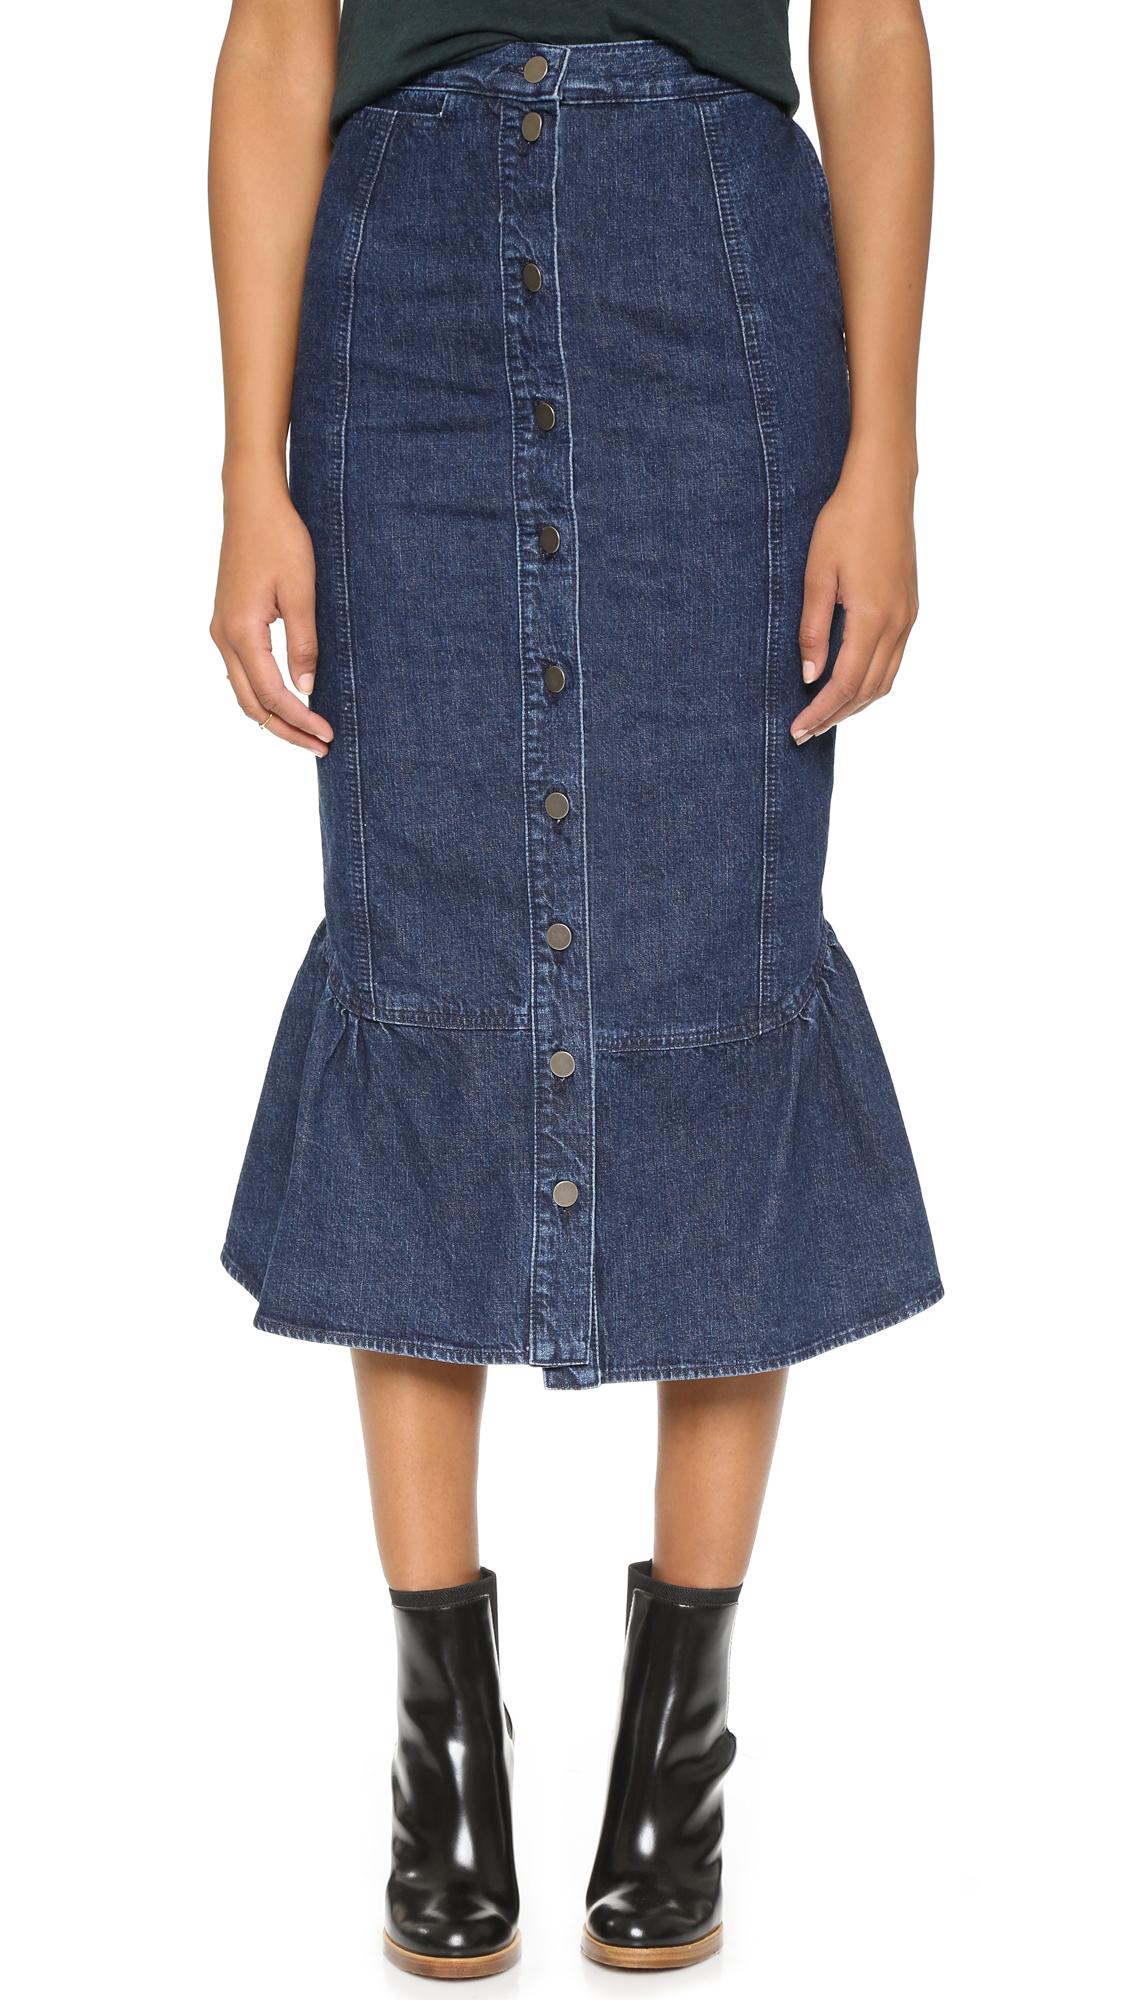 Rachel comey Range Denim Skirt - Indigo in Blue | Lyst